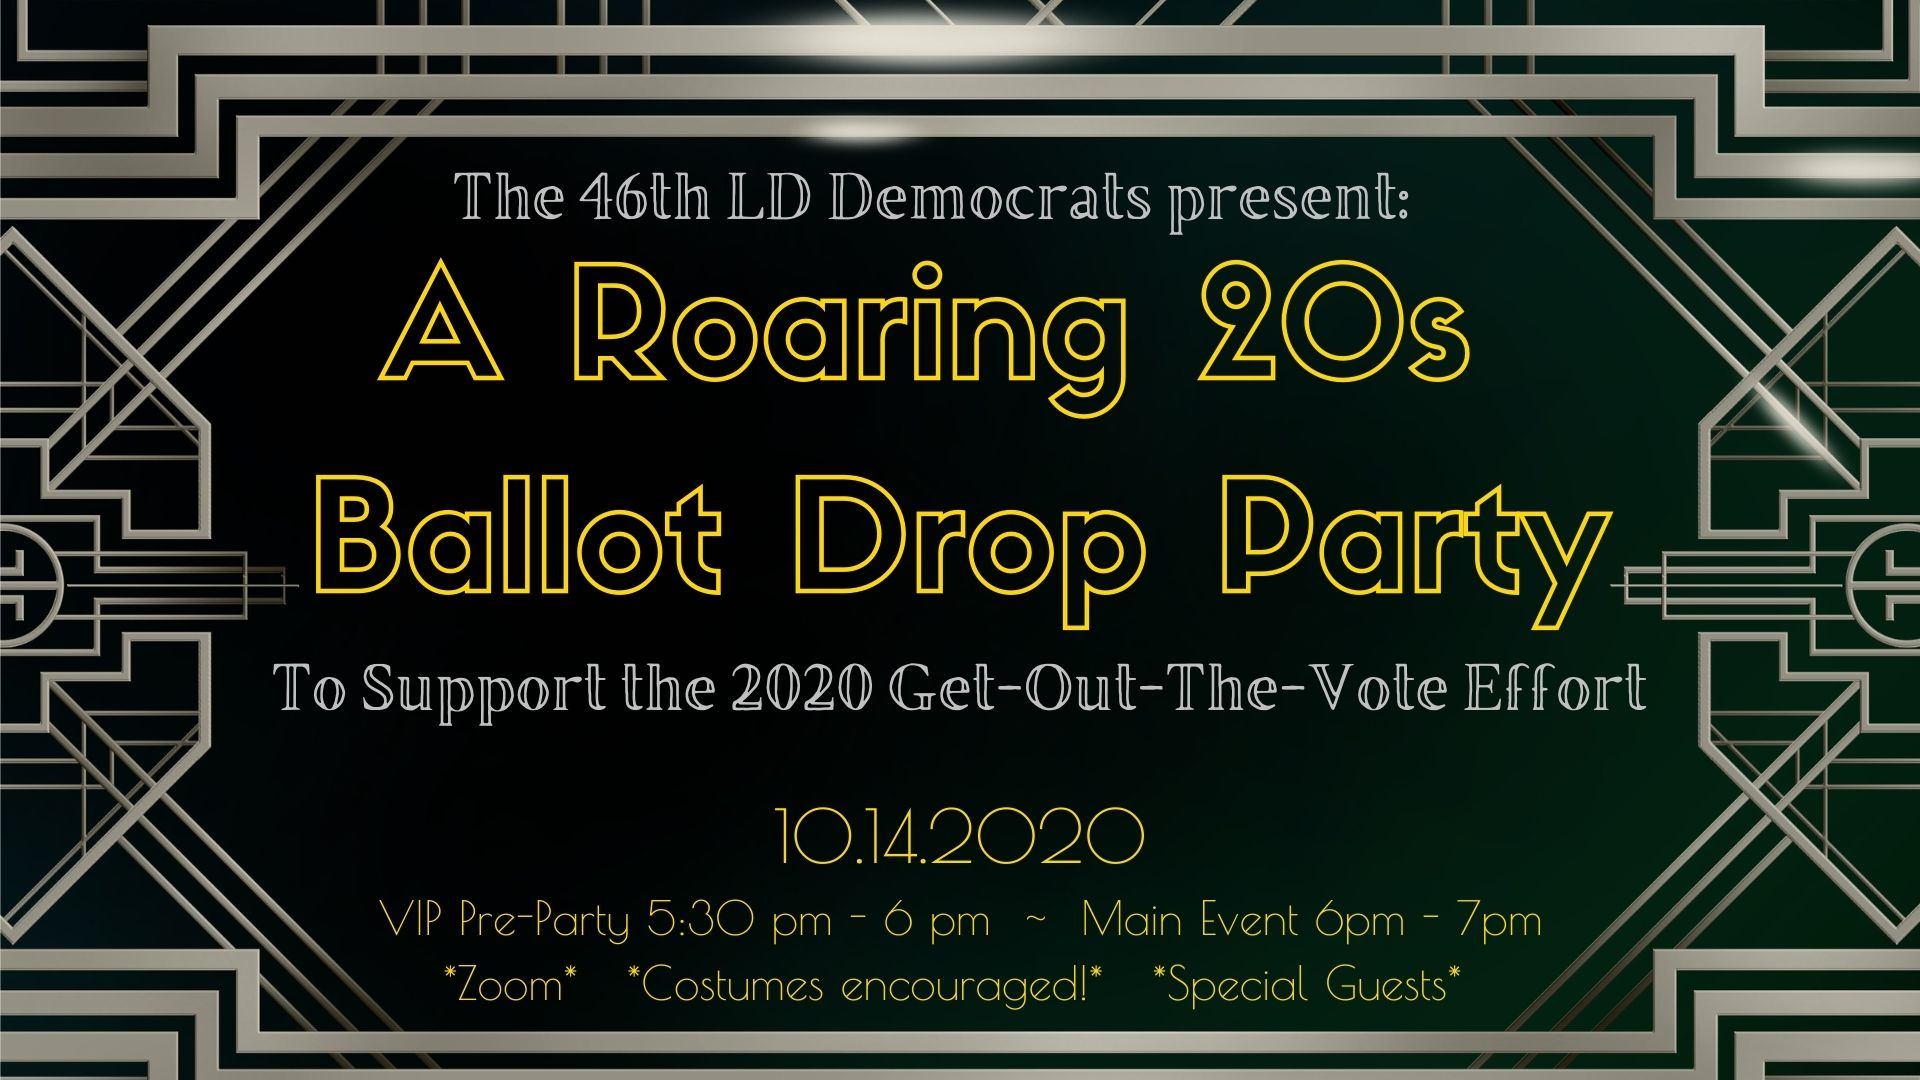 Roaring_20s_Ballot_Drop_Toast___Fundraiser_(2).jpg